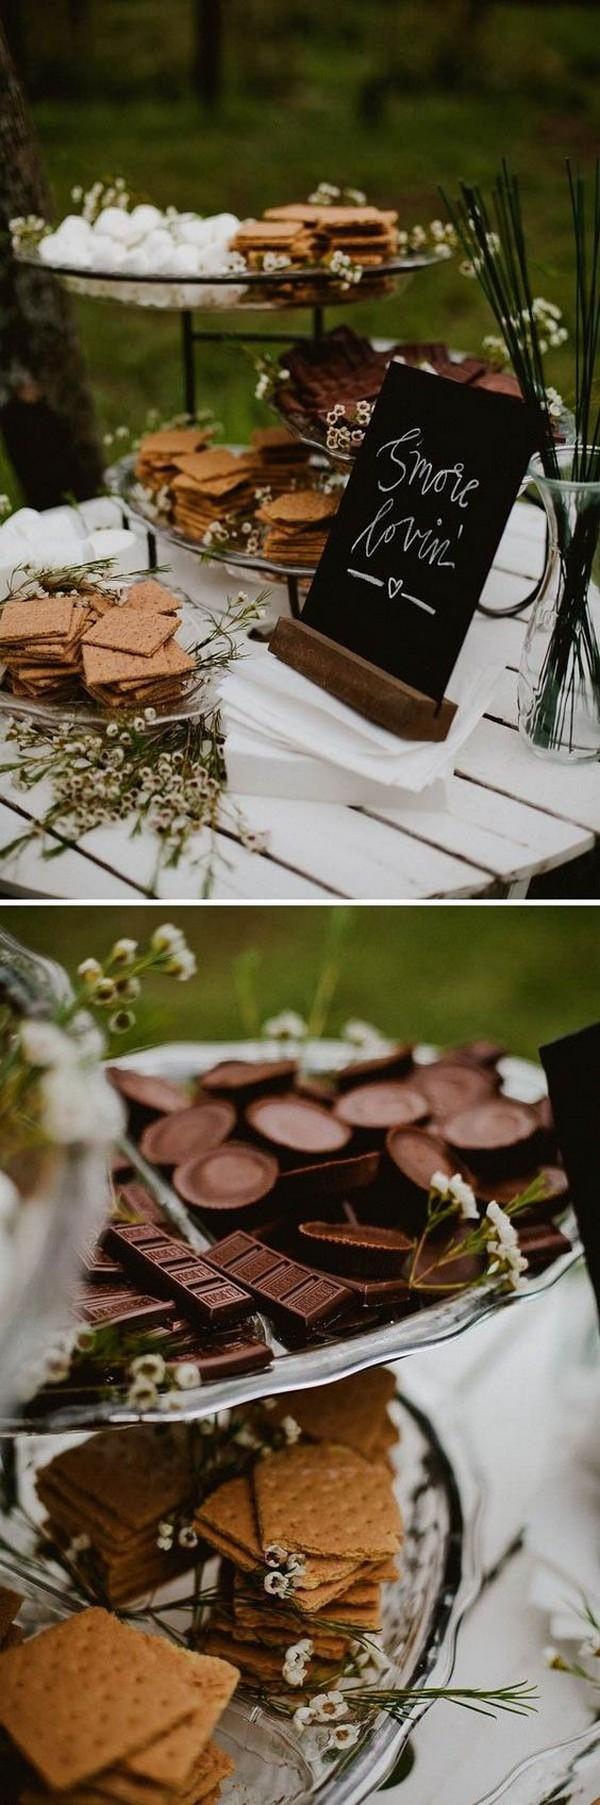 boho chic S'more bar wedding dessert display ideas